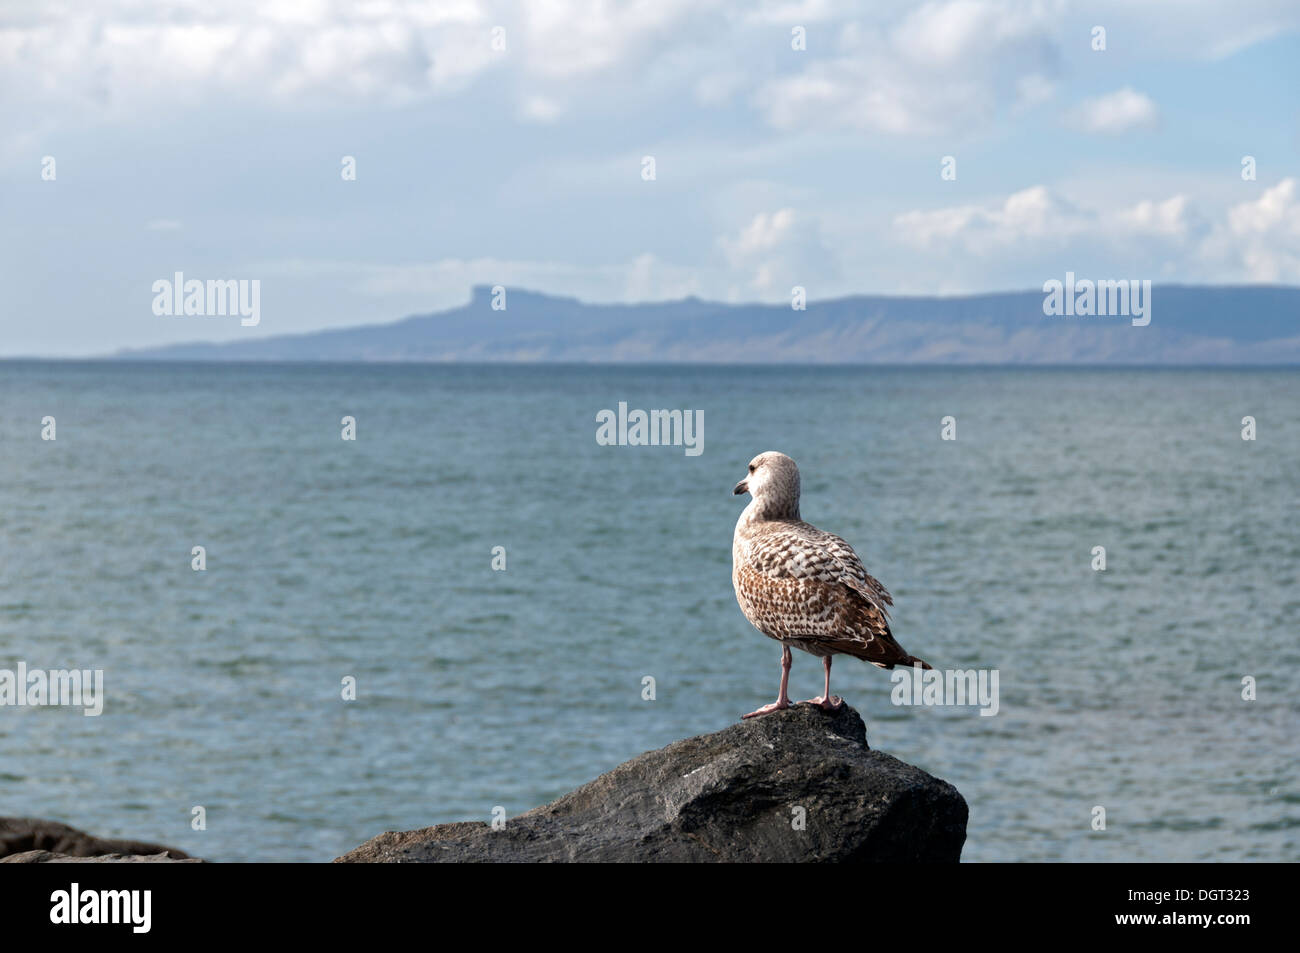 Immature Herring Gull (Larus argentatus), at Mallaig, Highland region, Scotland, UK.  The Isle of Eigg behind. - Stock Image